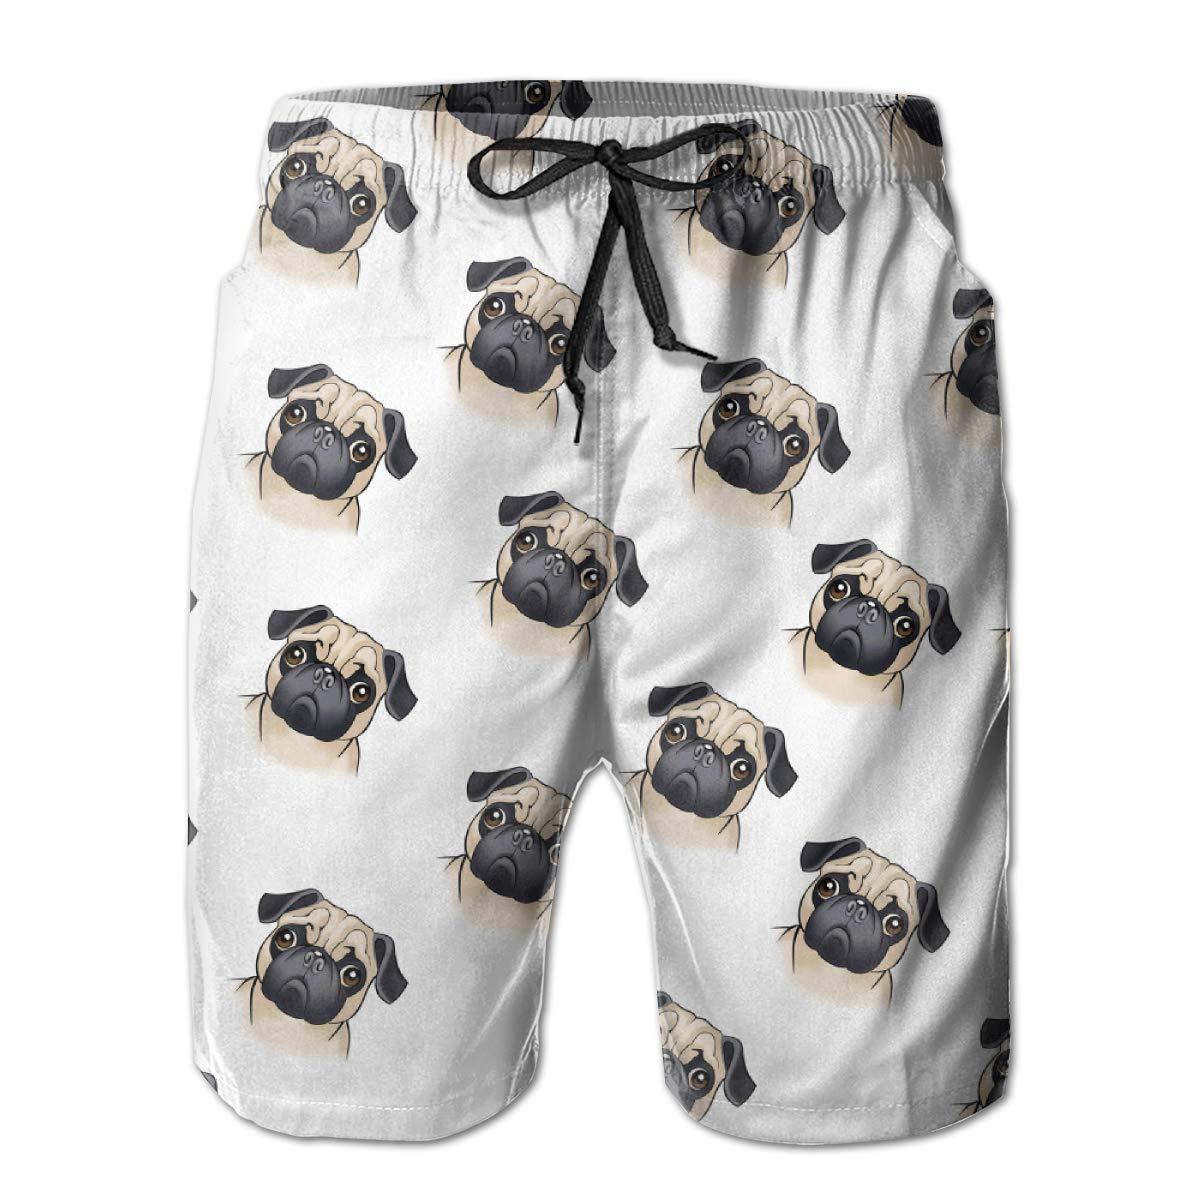 WMDJEG Cute Pug Pattern Mens Summer Beachwear Sports Running Swim Board Shorts Mesh Lining